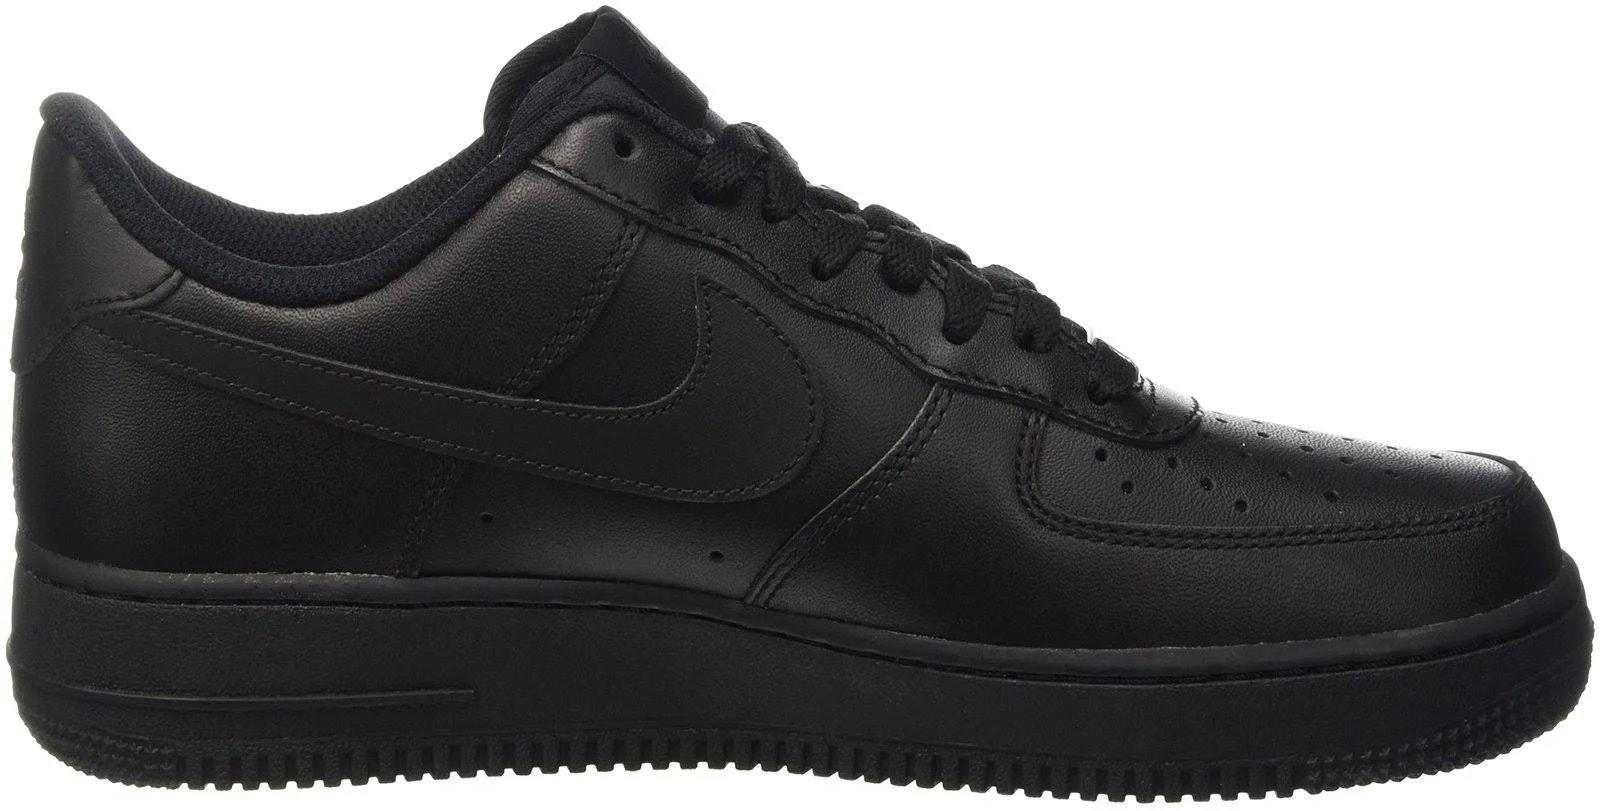 Nike Airforce Ones